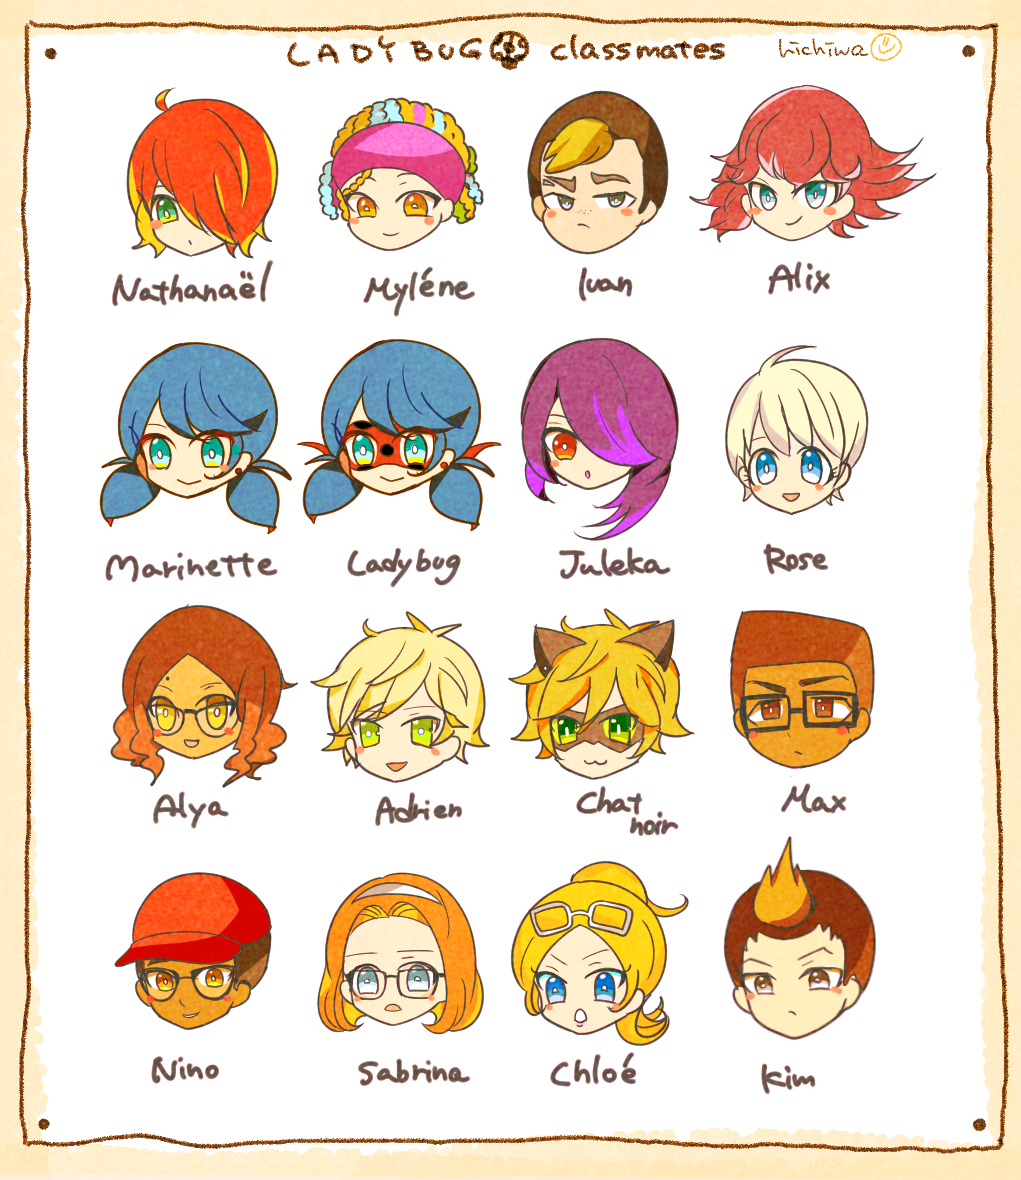 Marinette's classmates